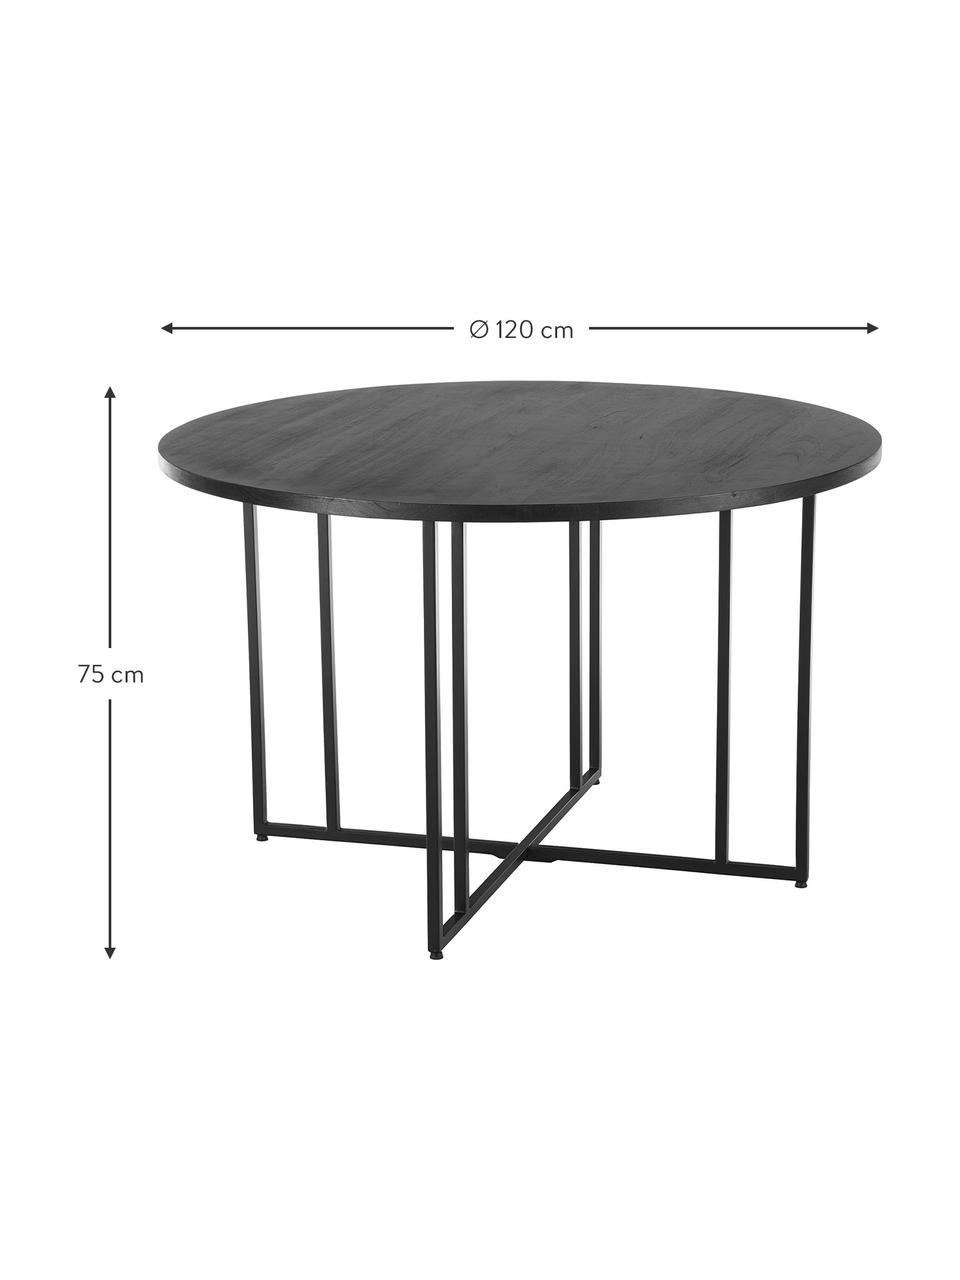 Runder Esstisch mit Massivholzplatte, Tischplatte: Massives Mangoholz, gebür, Gestell: Metall, pulverbeschichtet, Mangoholz, schwarz lackiert, Ø 140 x H 75 cm